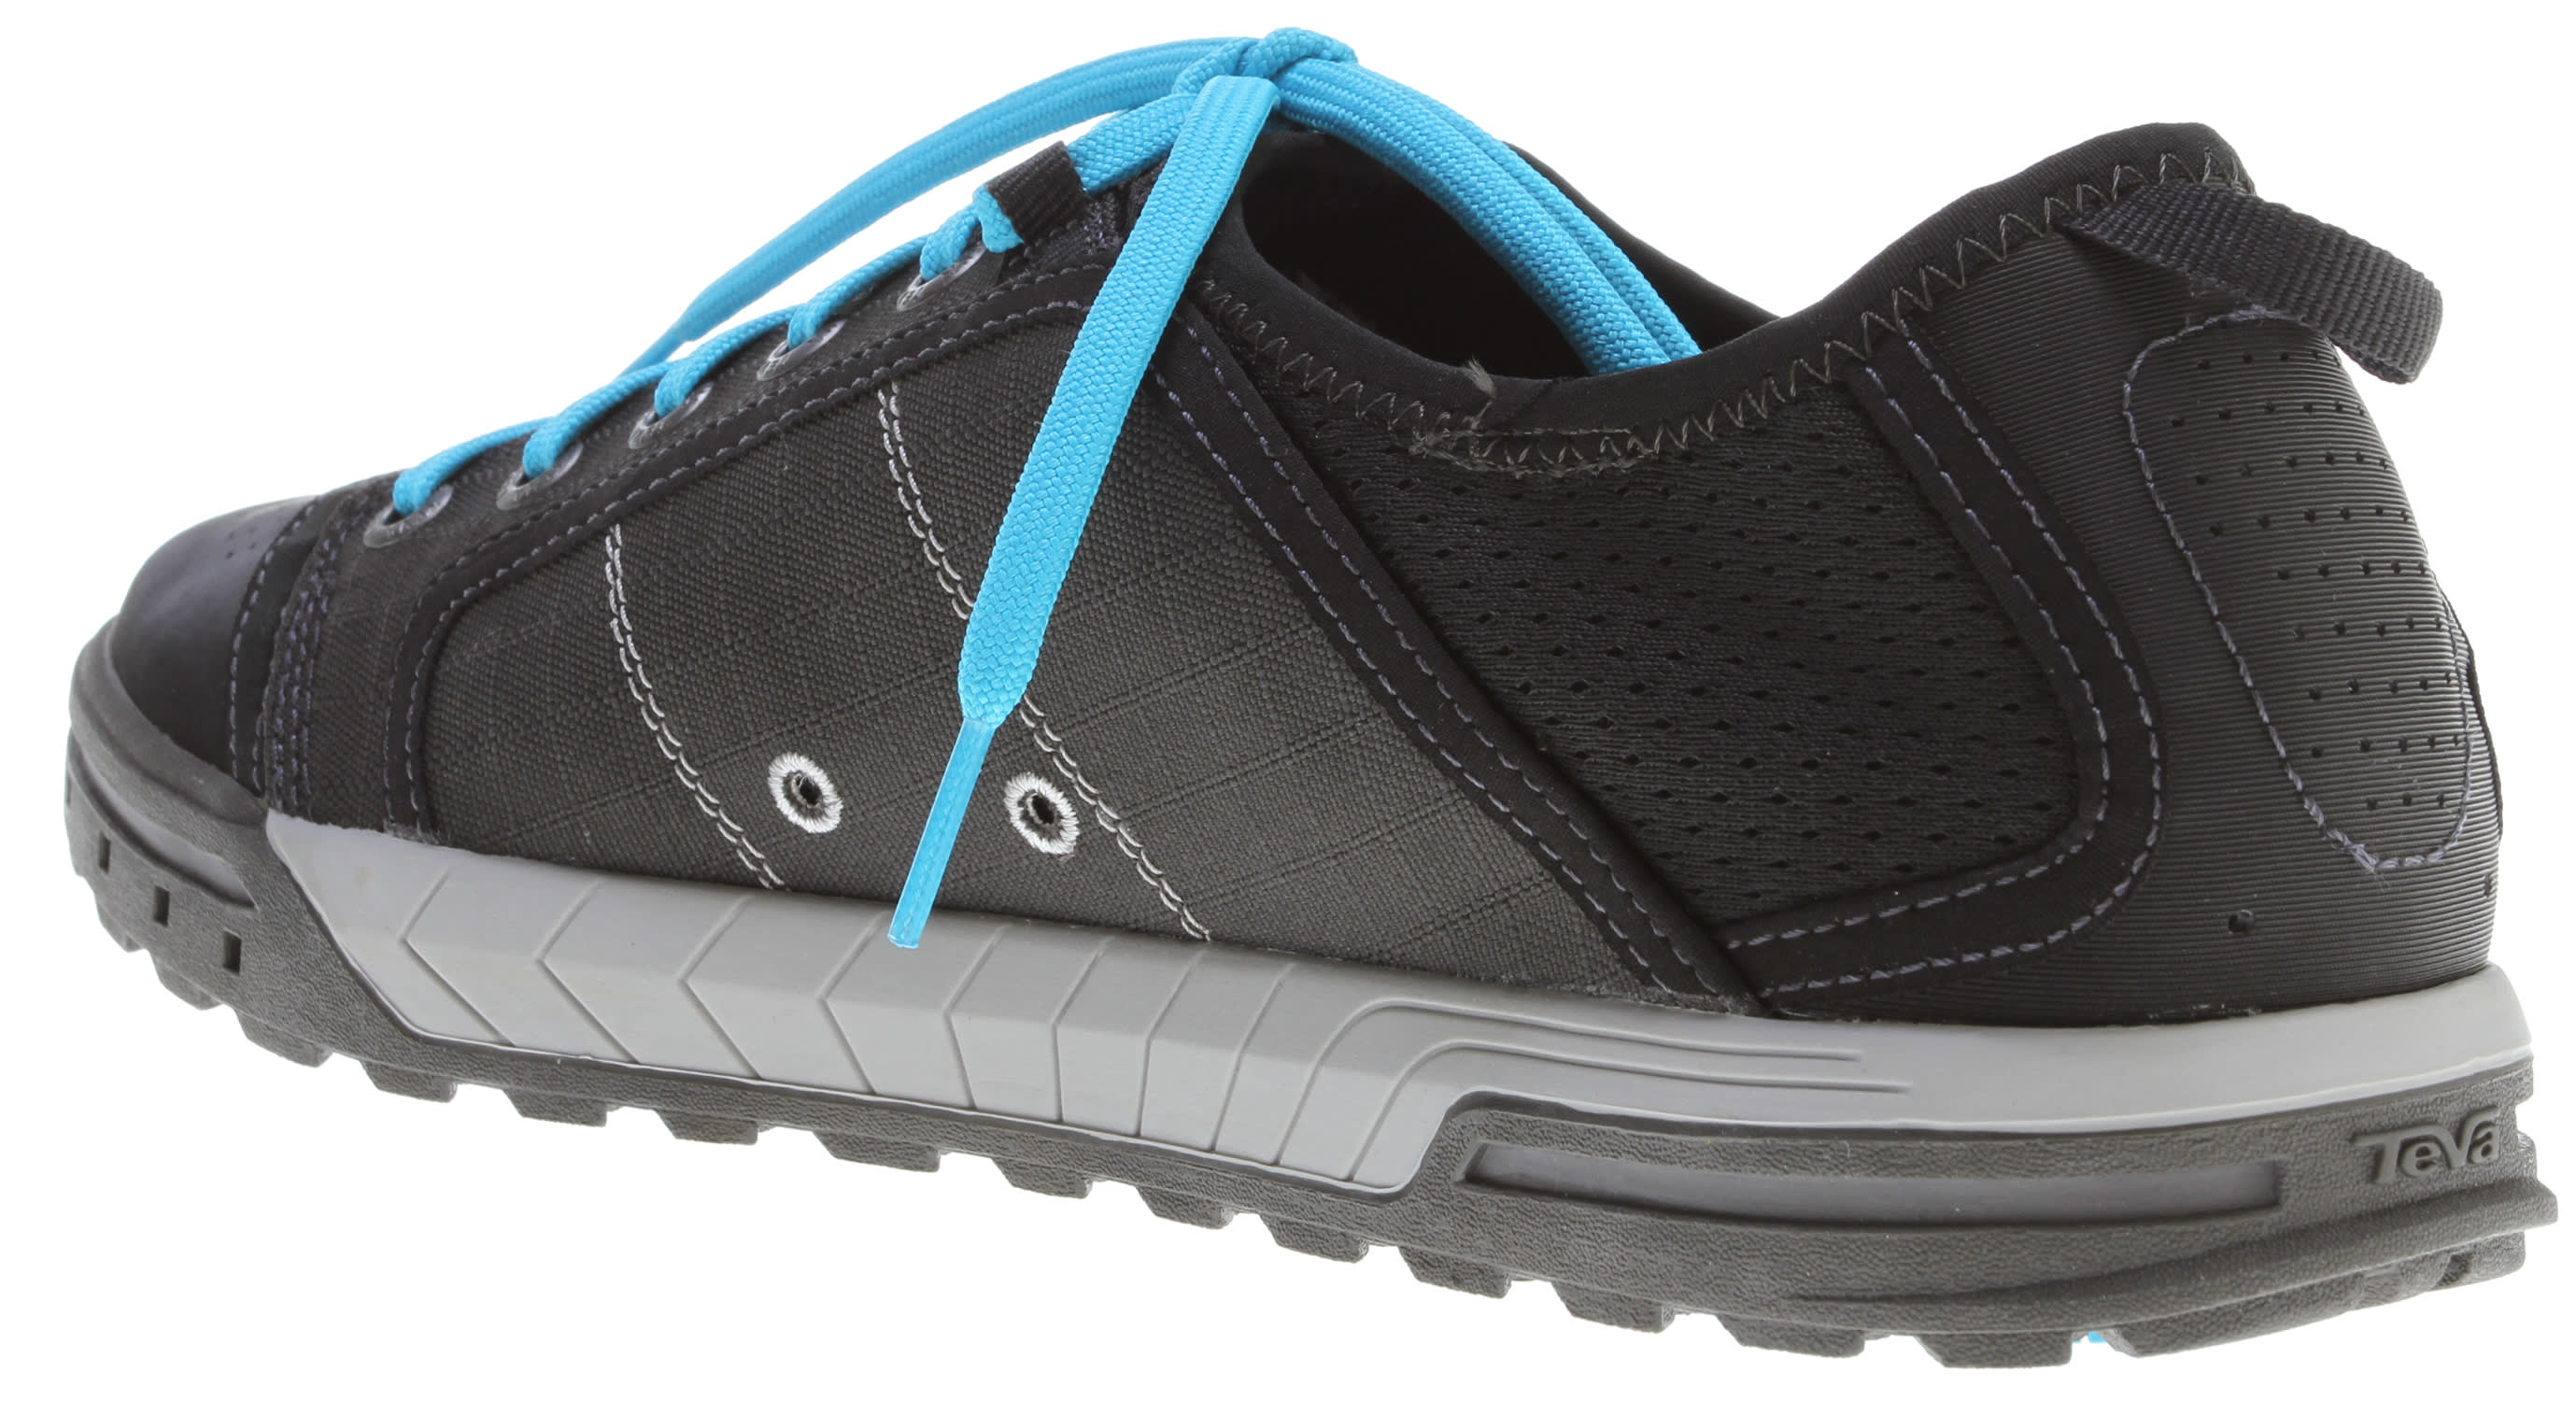 01bc06ff015a Teva Fuse-Ion Water Shoes - thumbnail 3